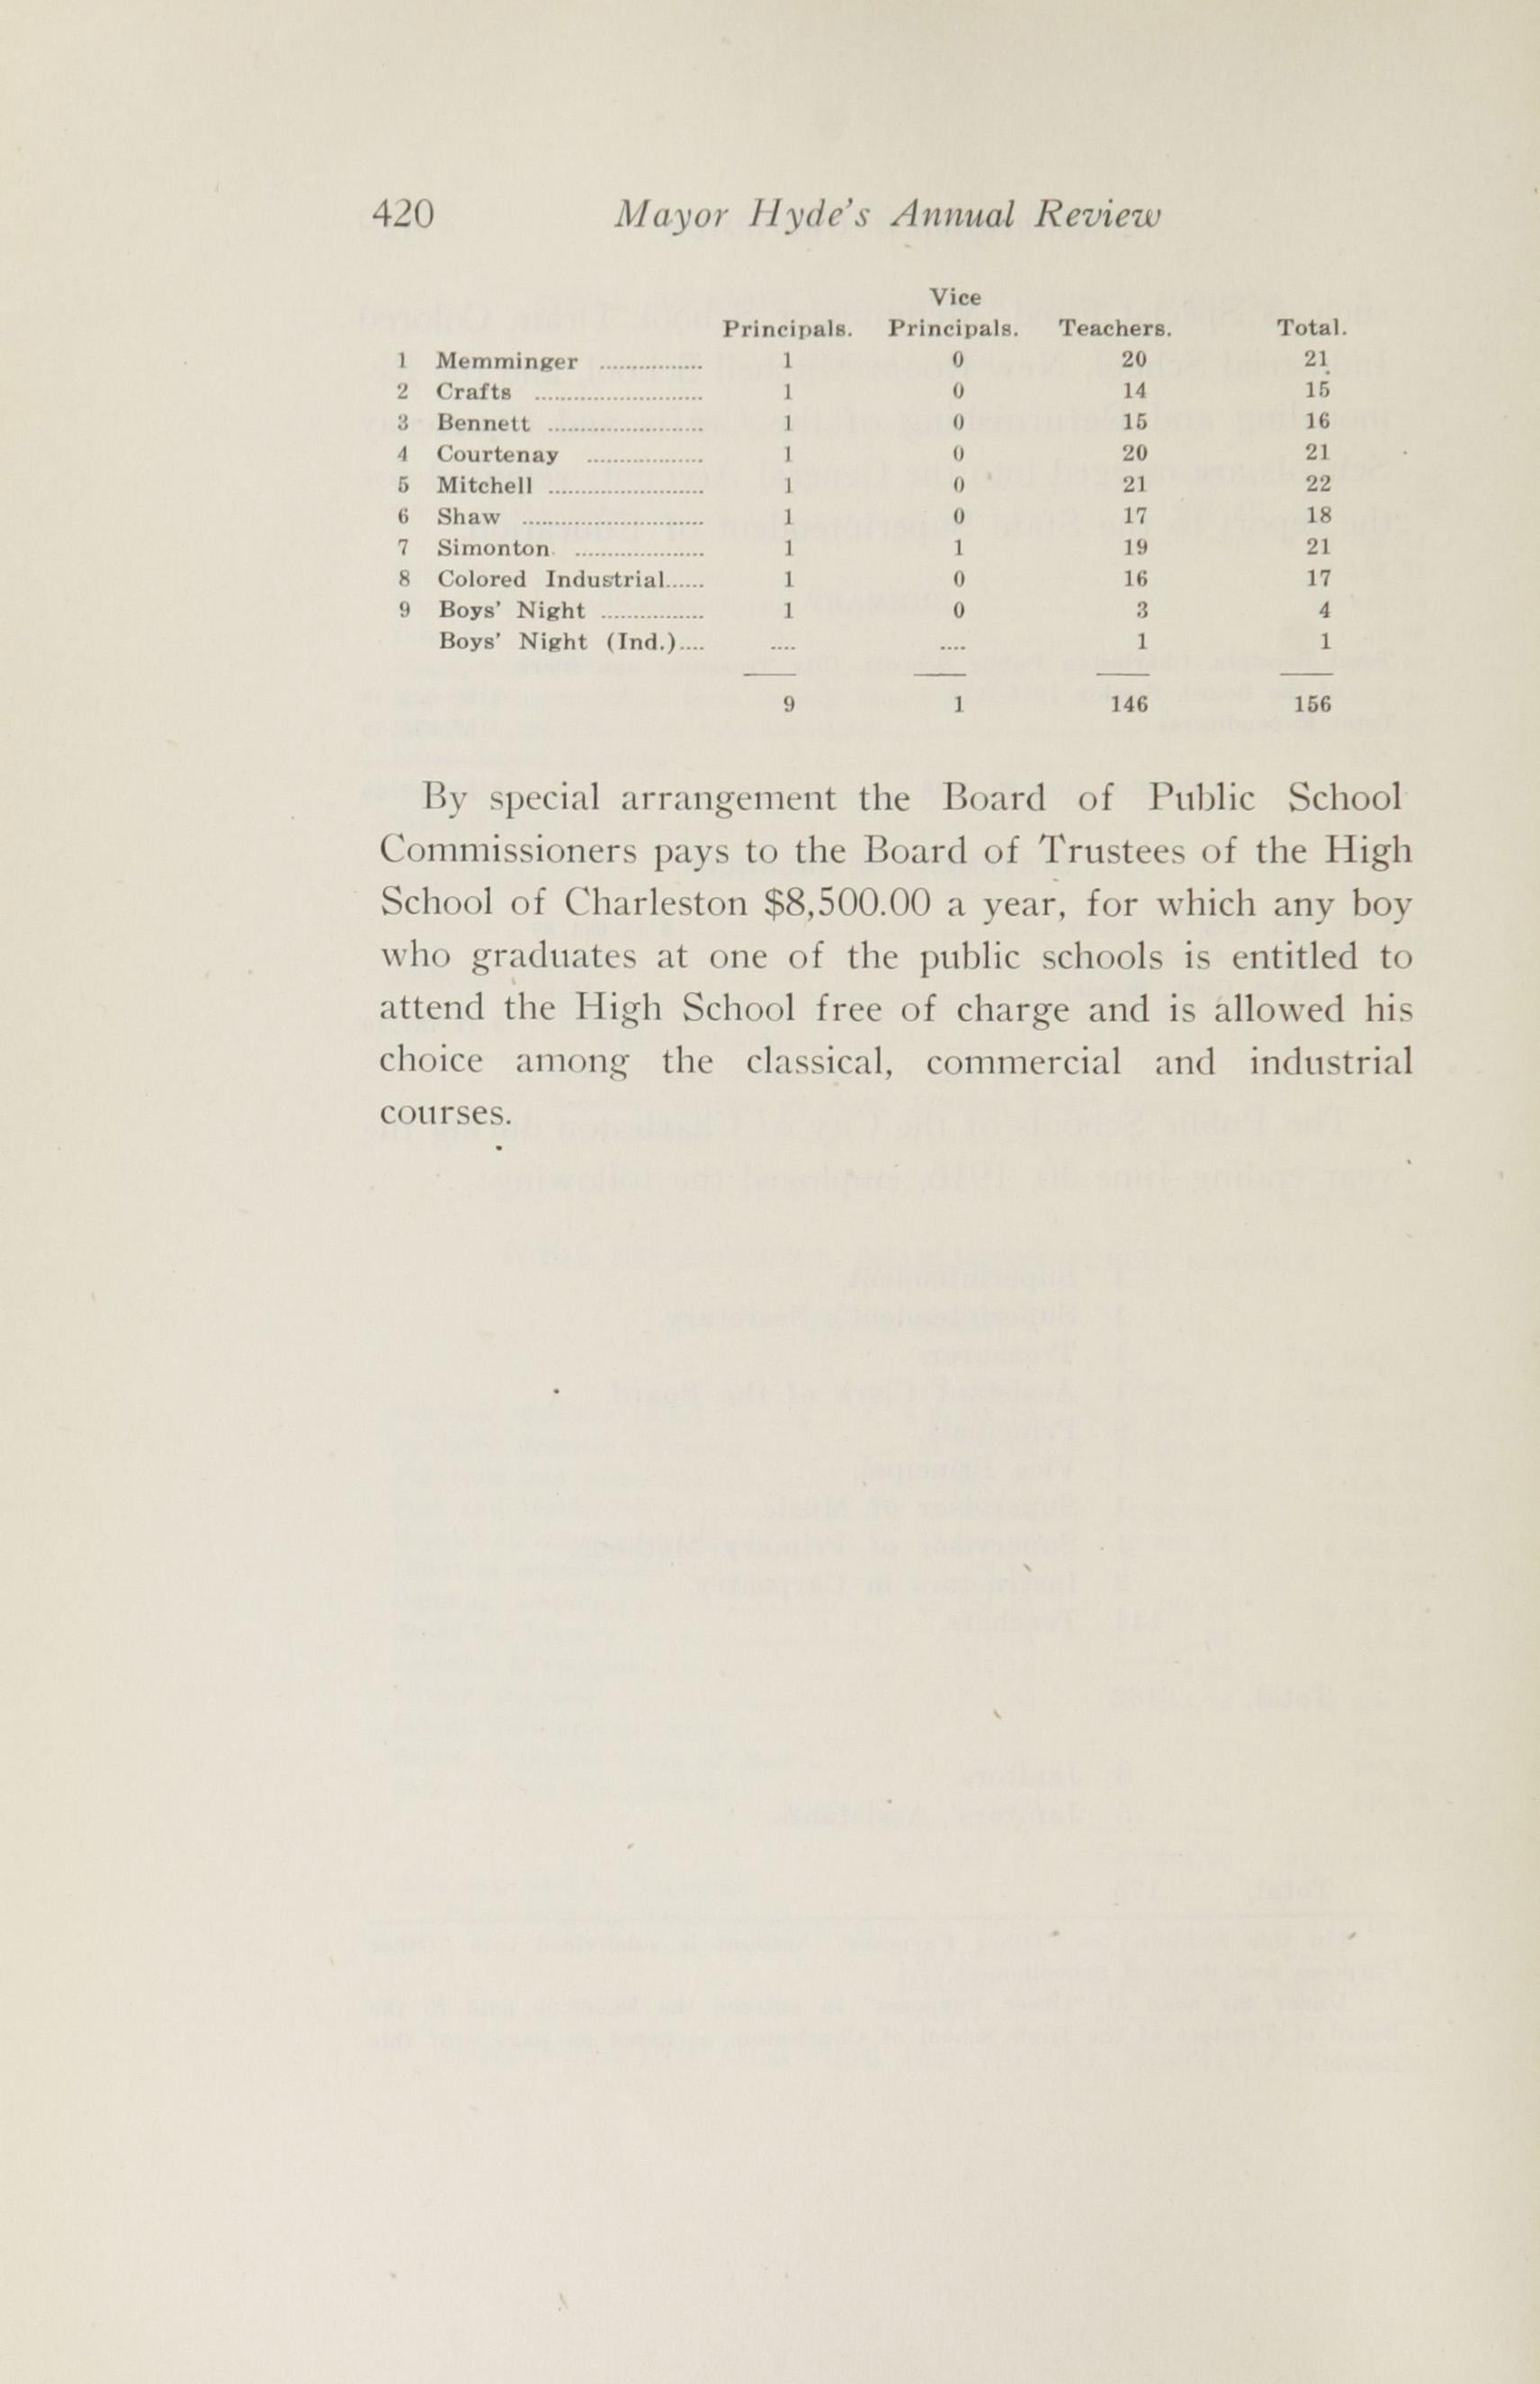 Charleston Yearbook, 1916, page 420